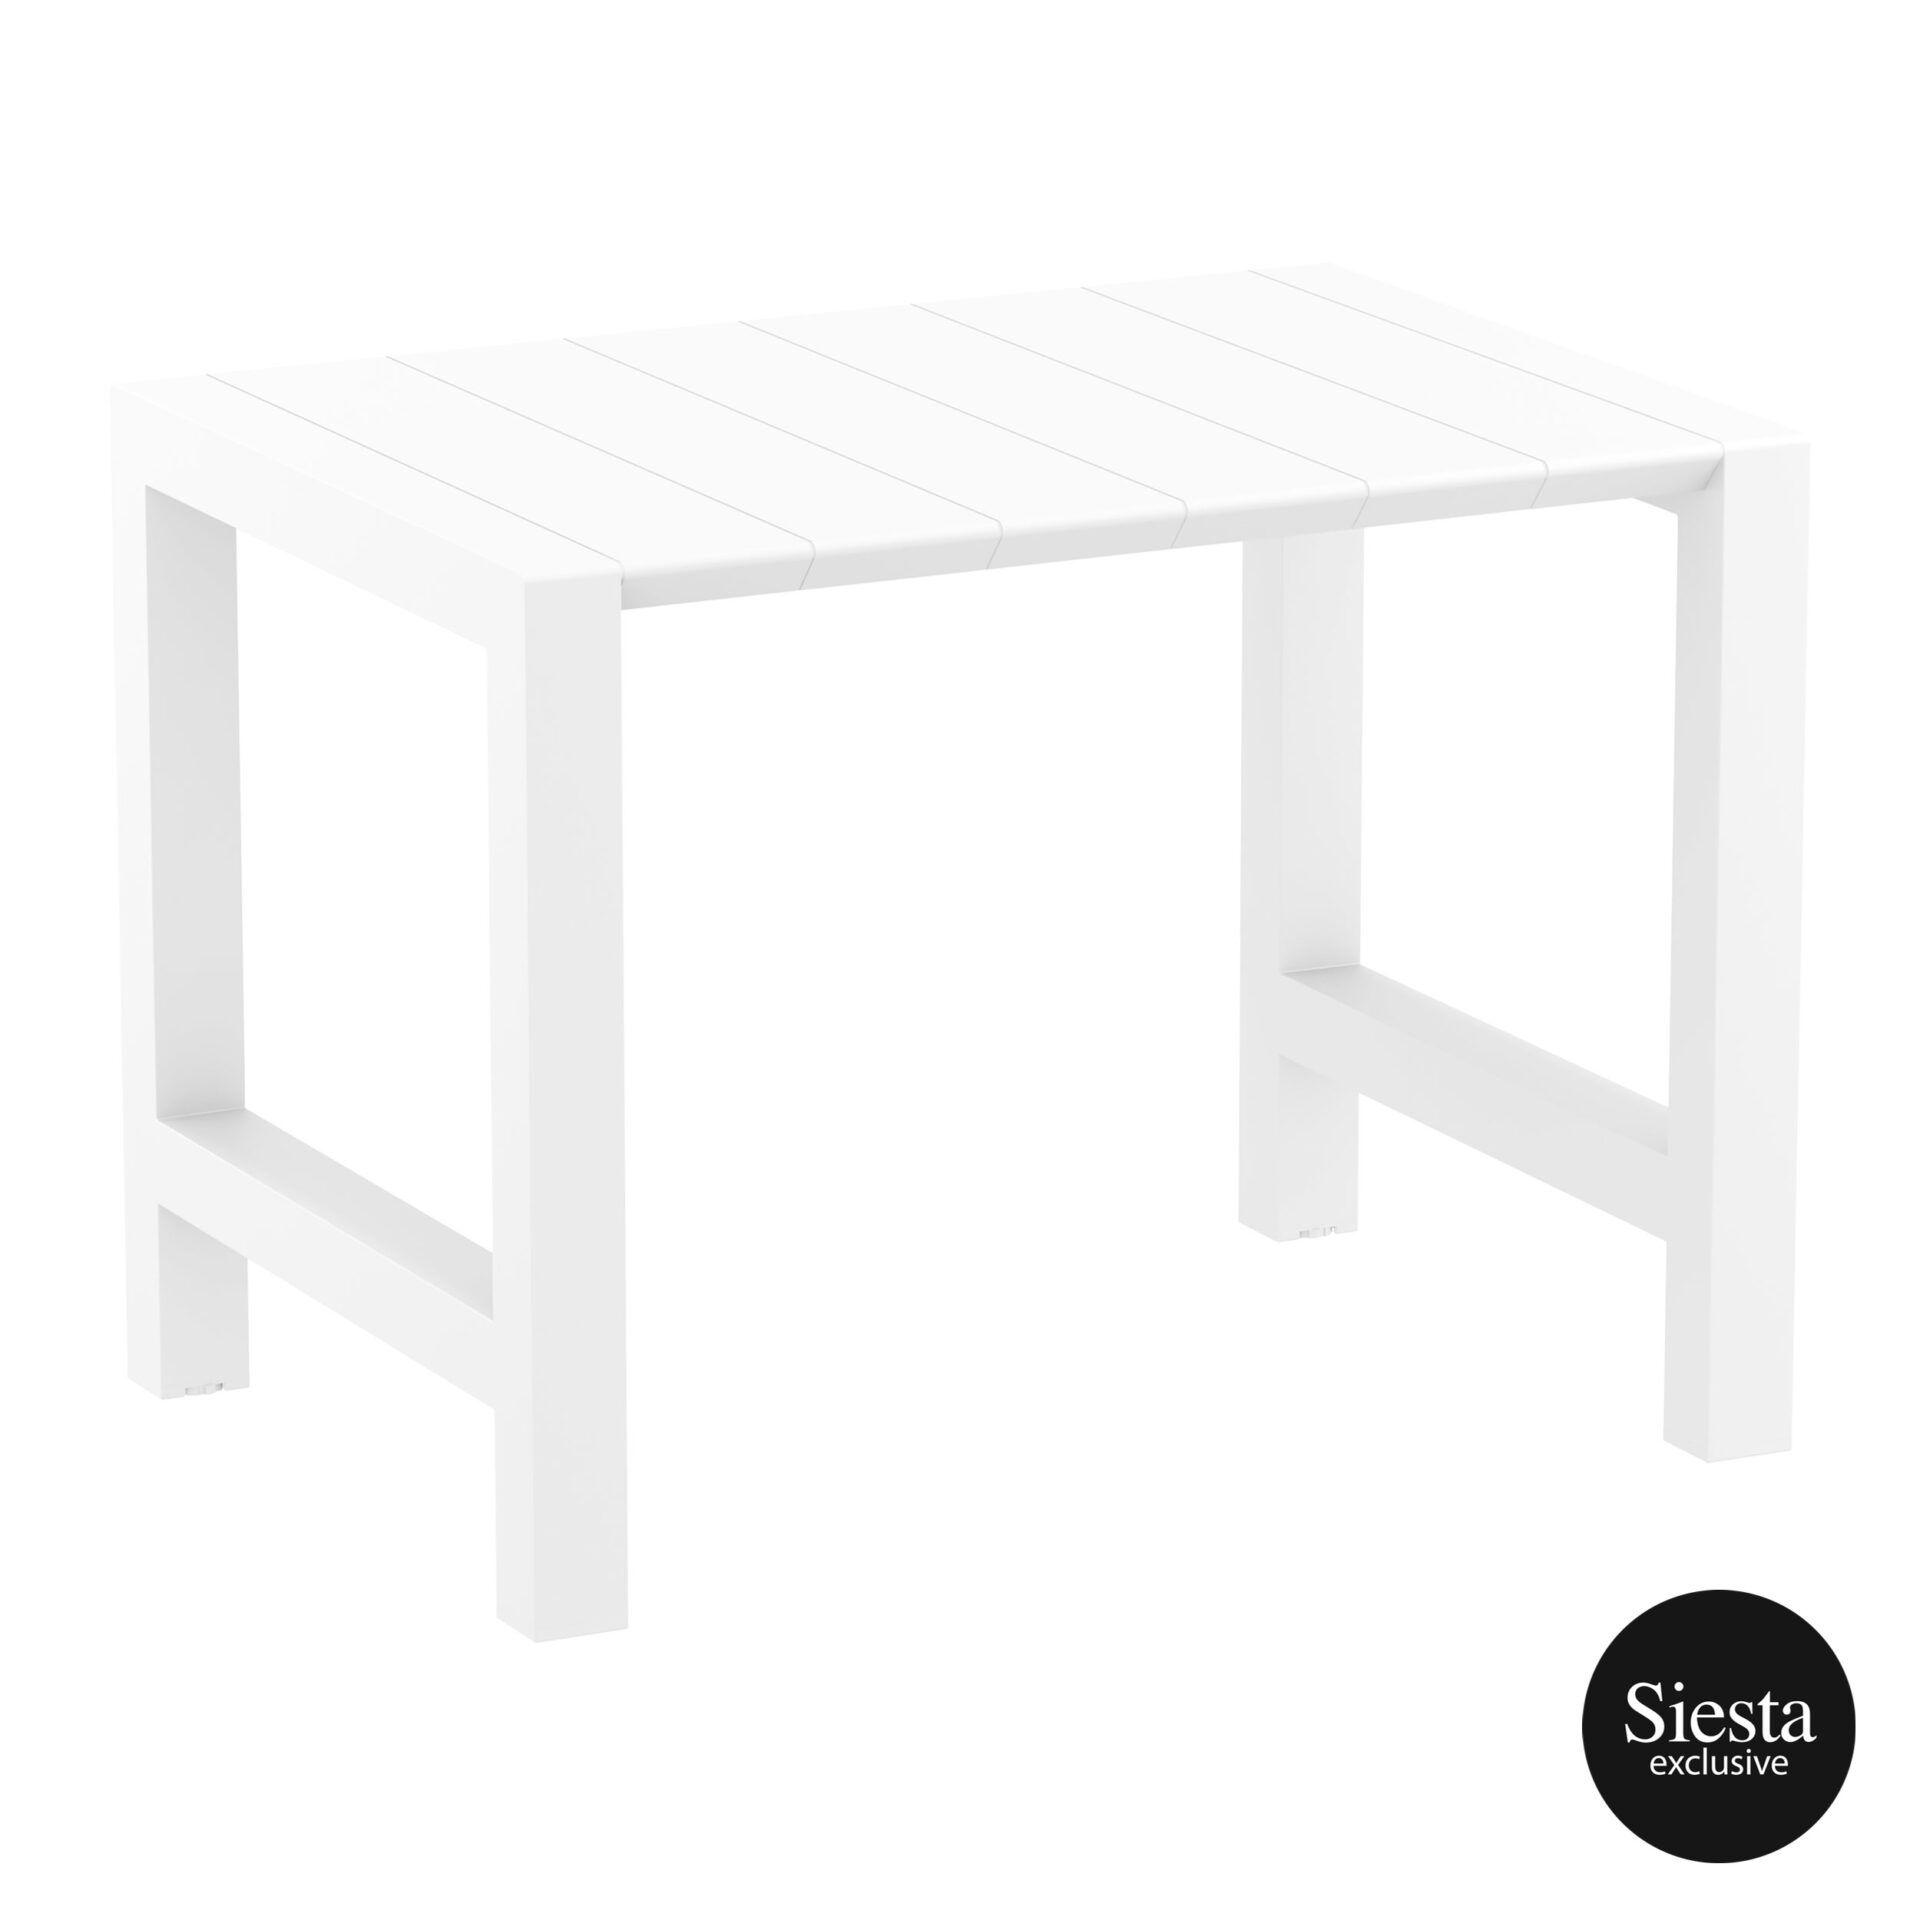 014 vegas bar table 140 white front side